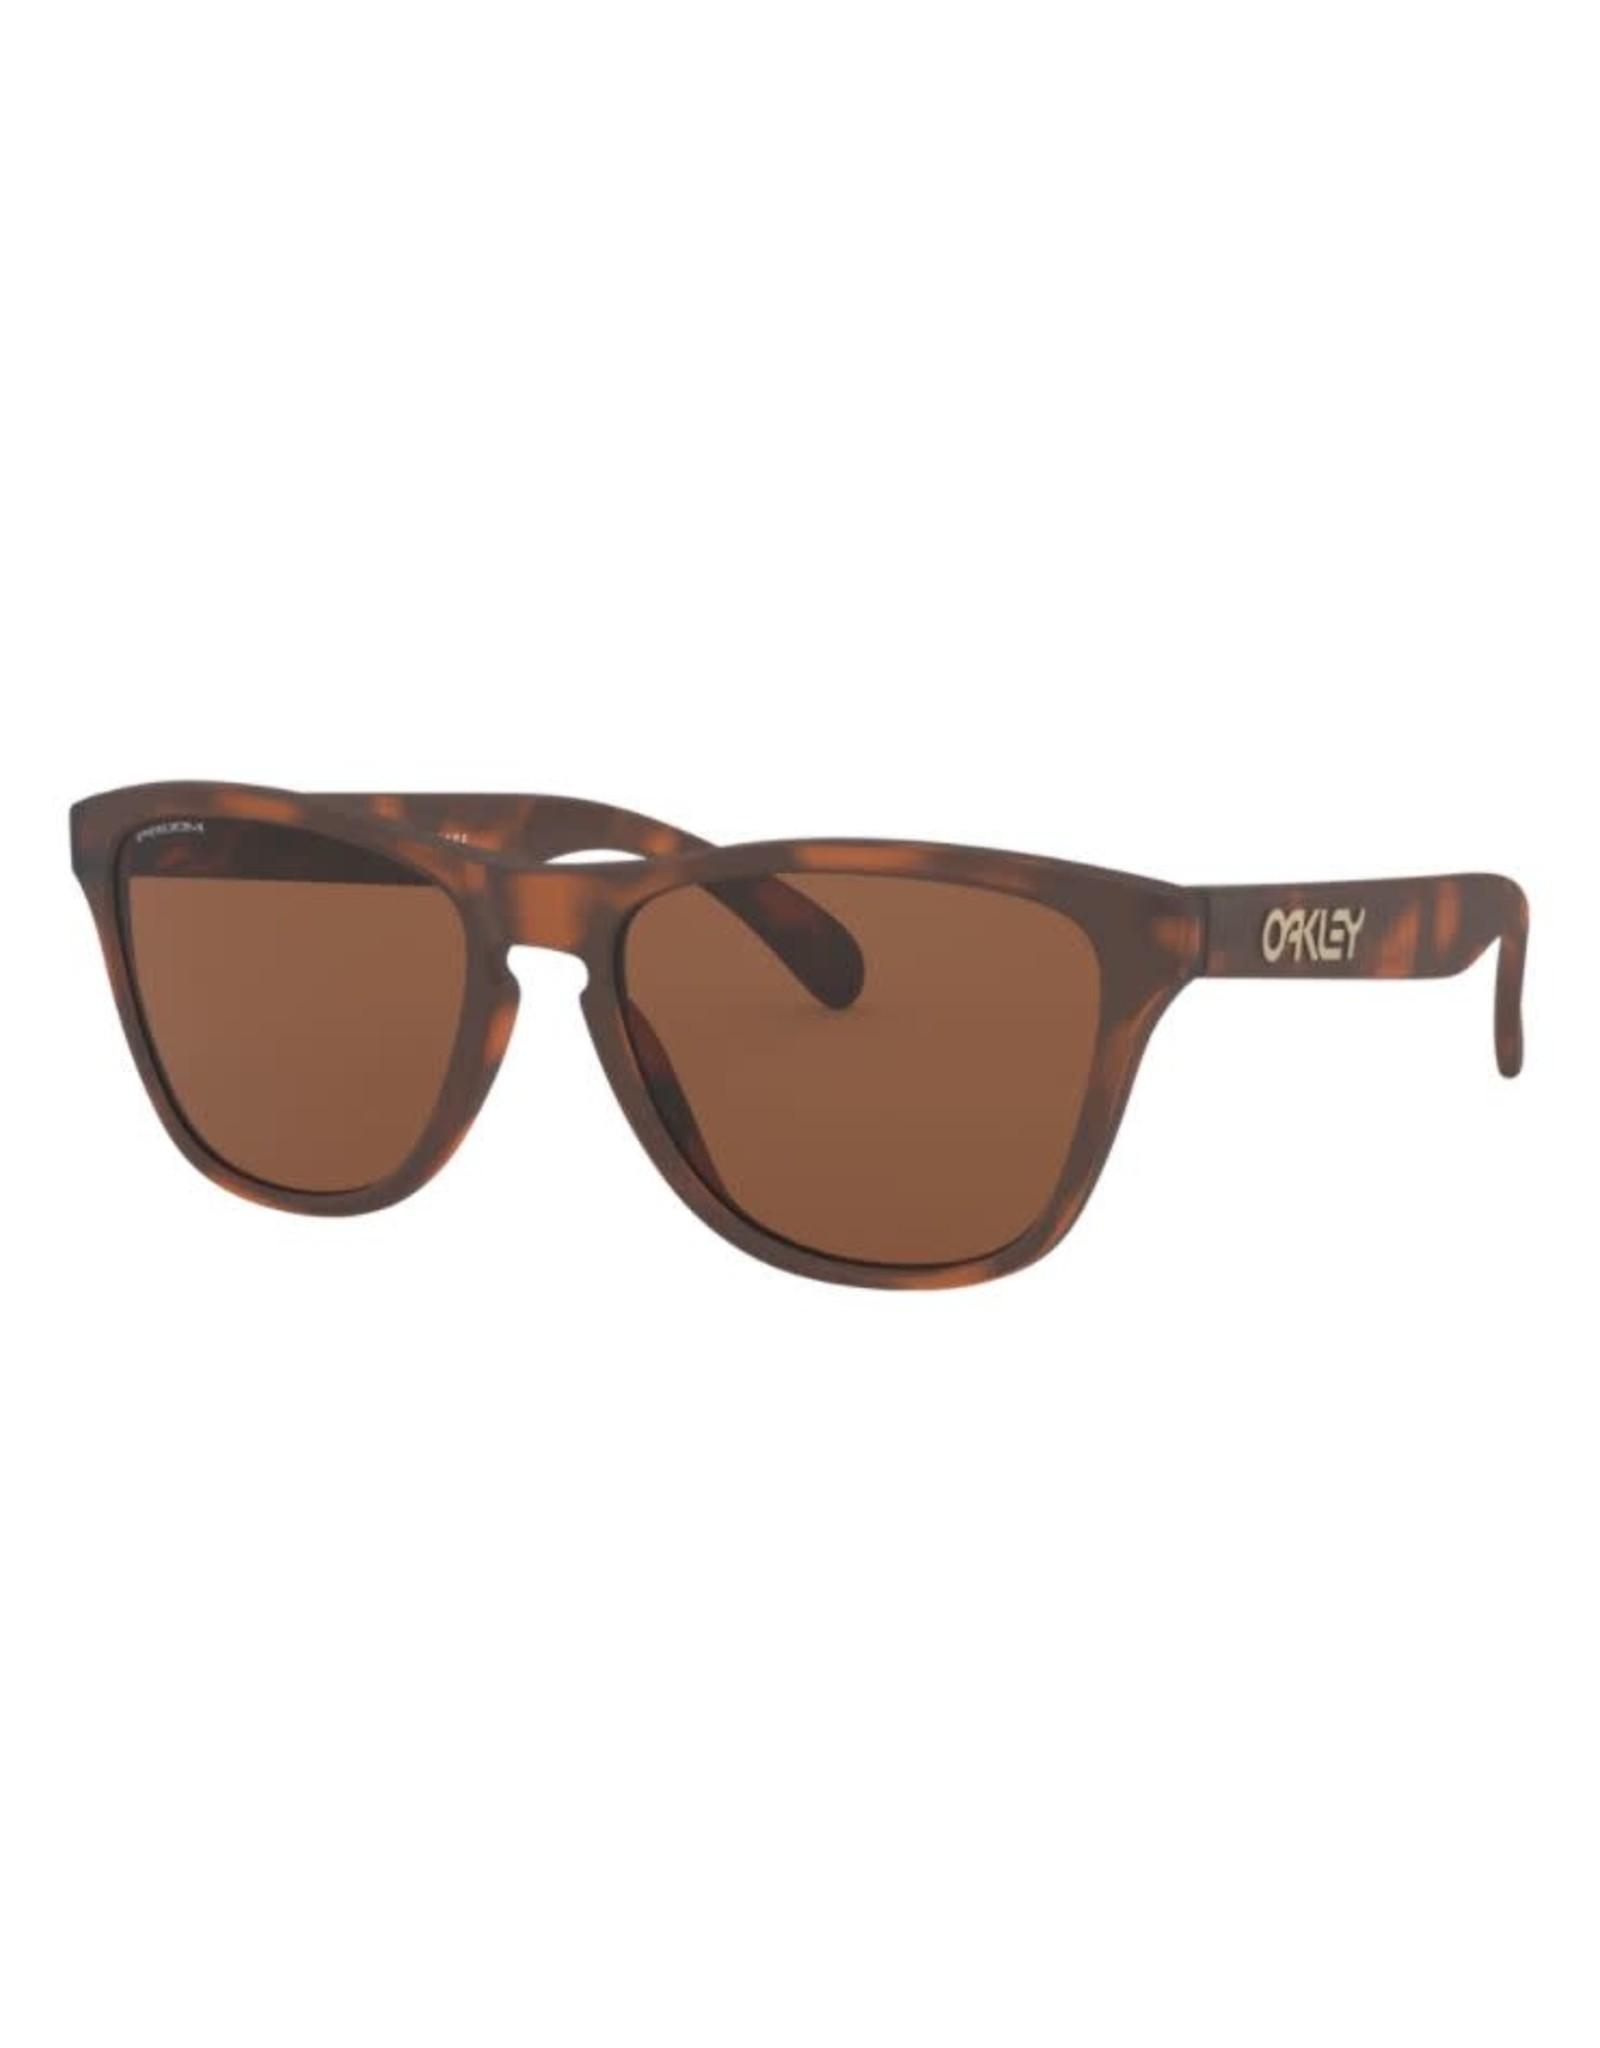 Oakley Oakley - Lunette soleil junior xs matte brown tortoise/lens prizm tungste